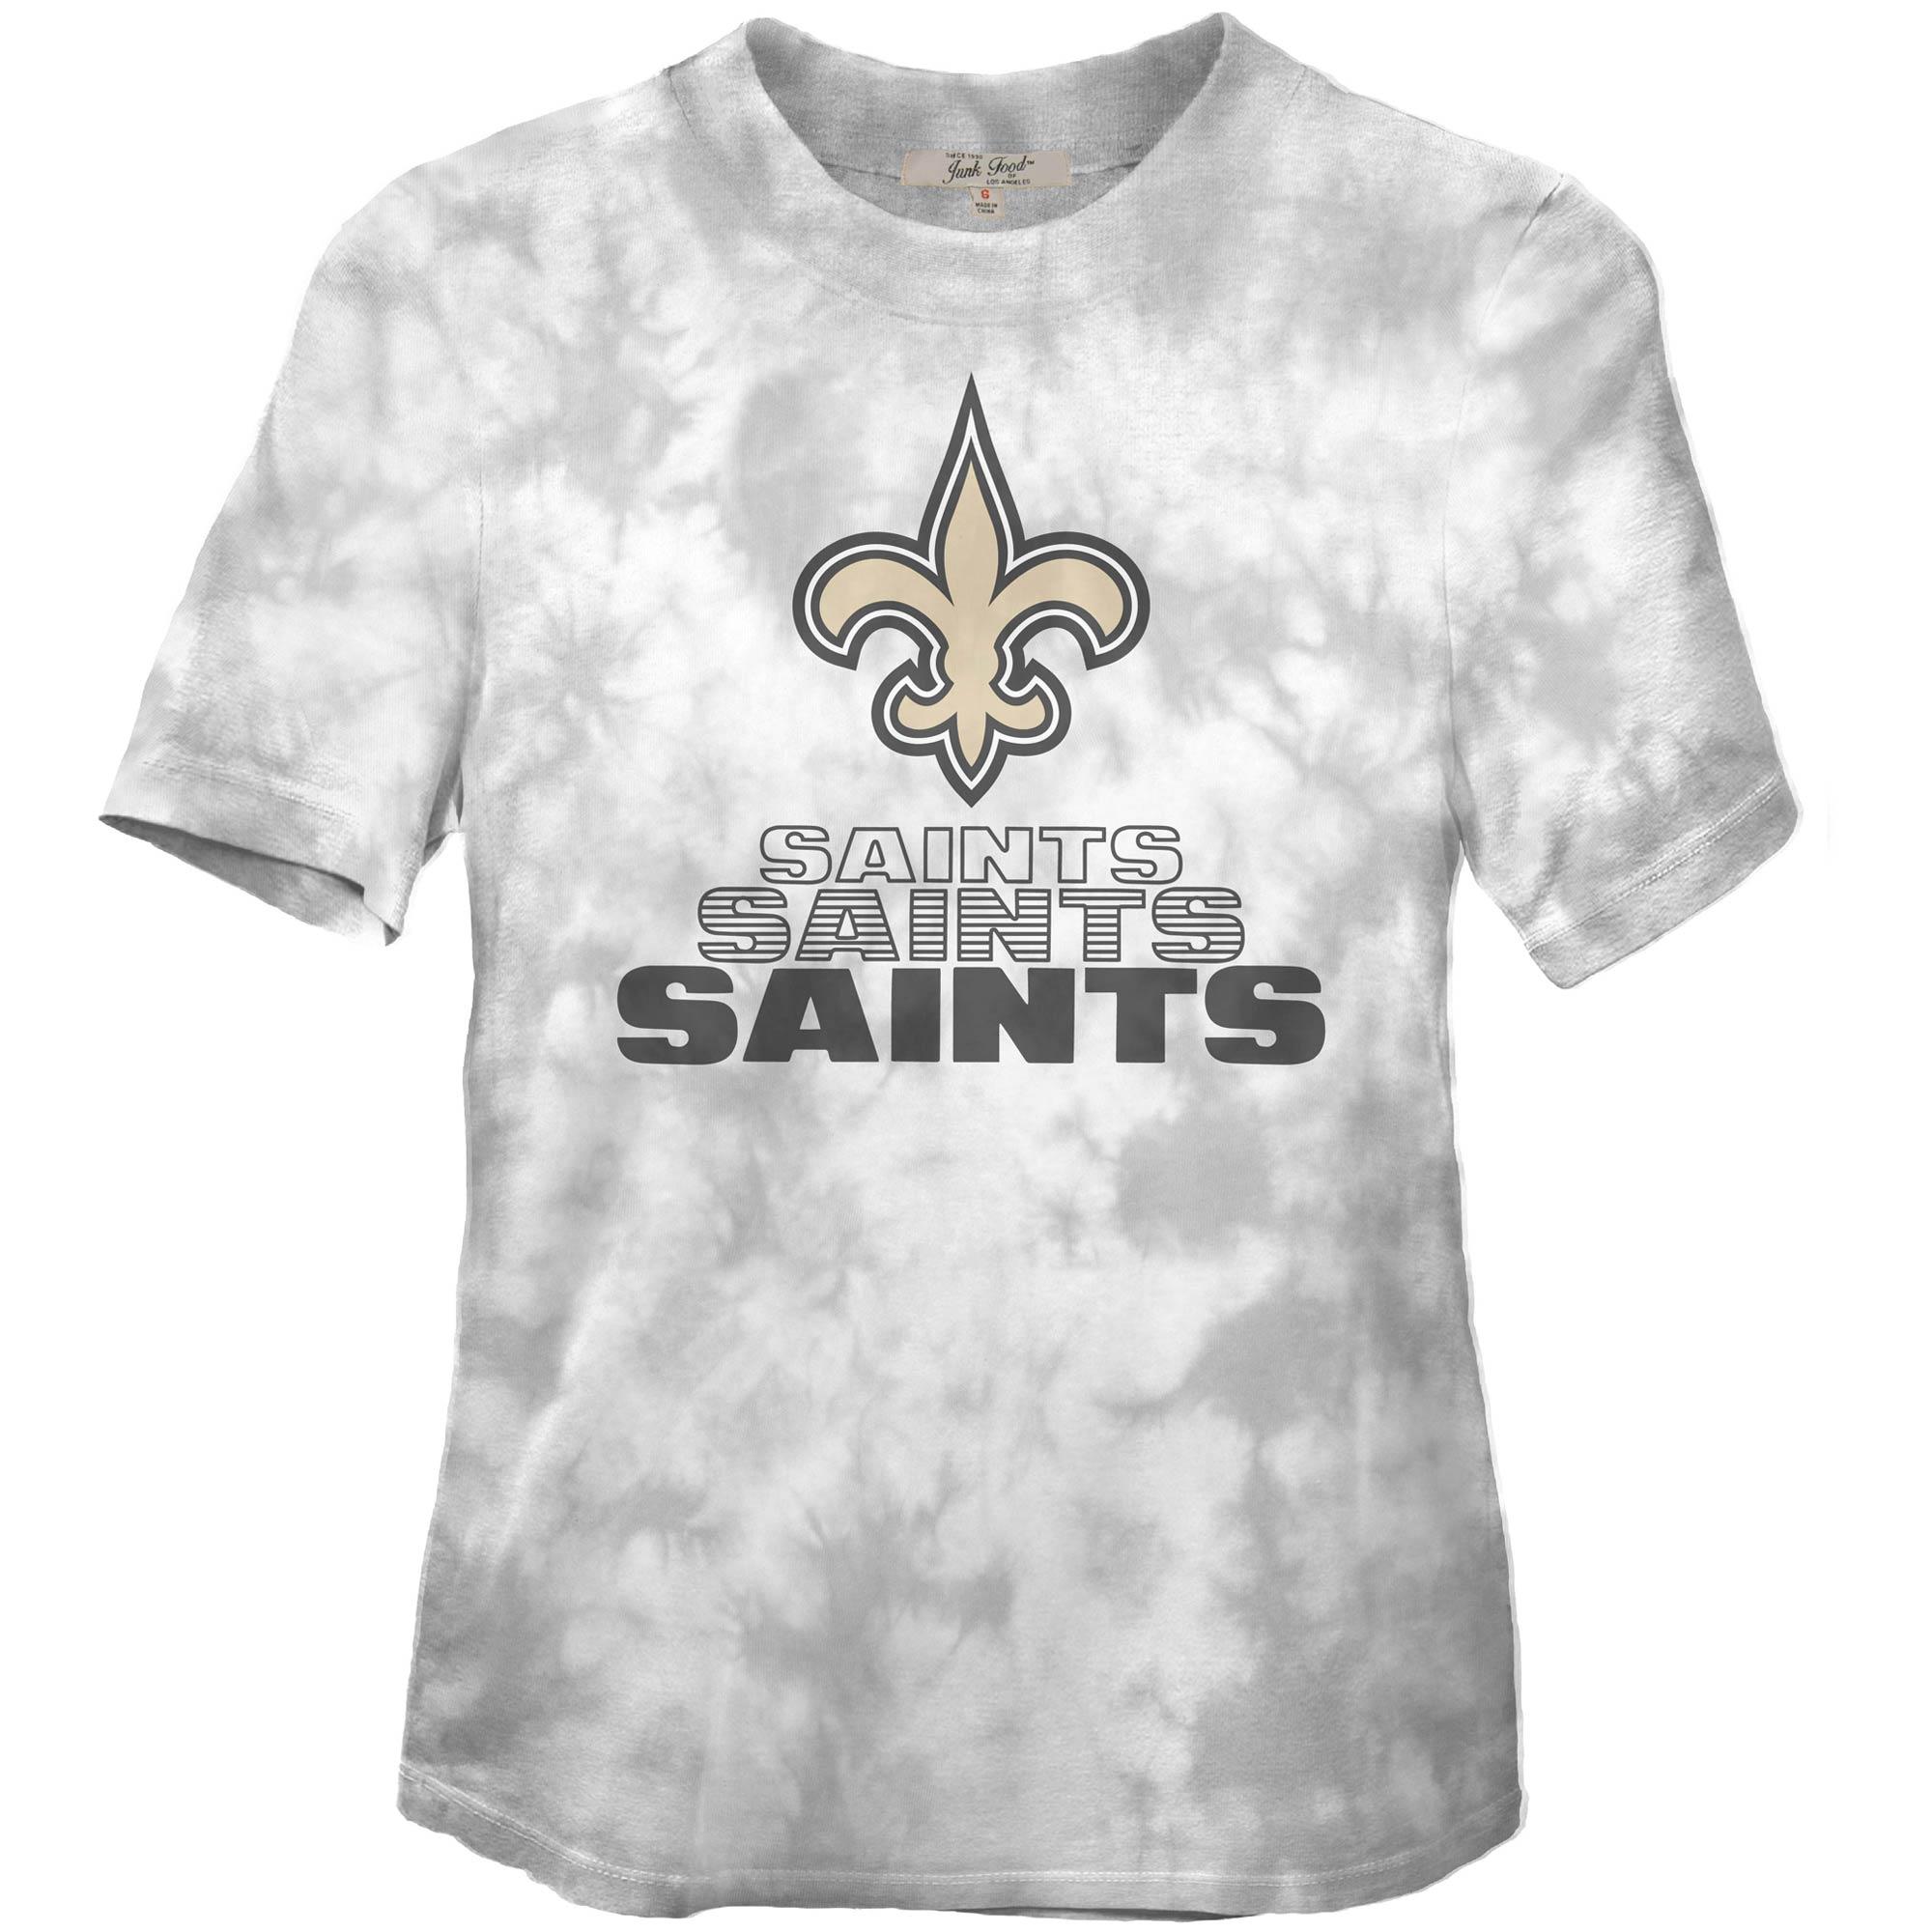 New Orleans Saints Junk Food Women's Team Spirit Tie-Dye T-Shirt - Black